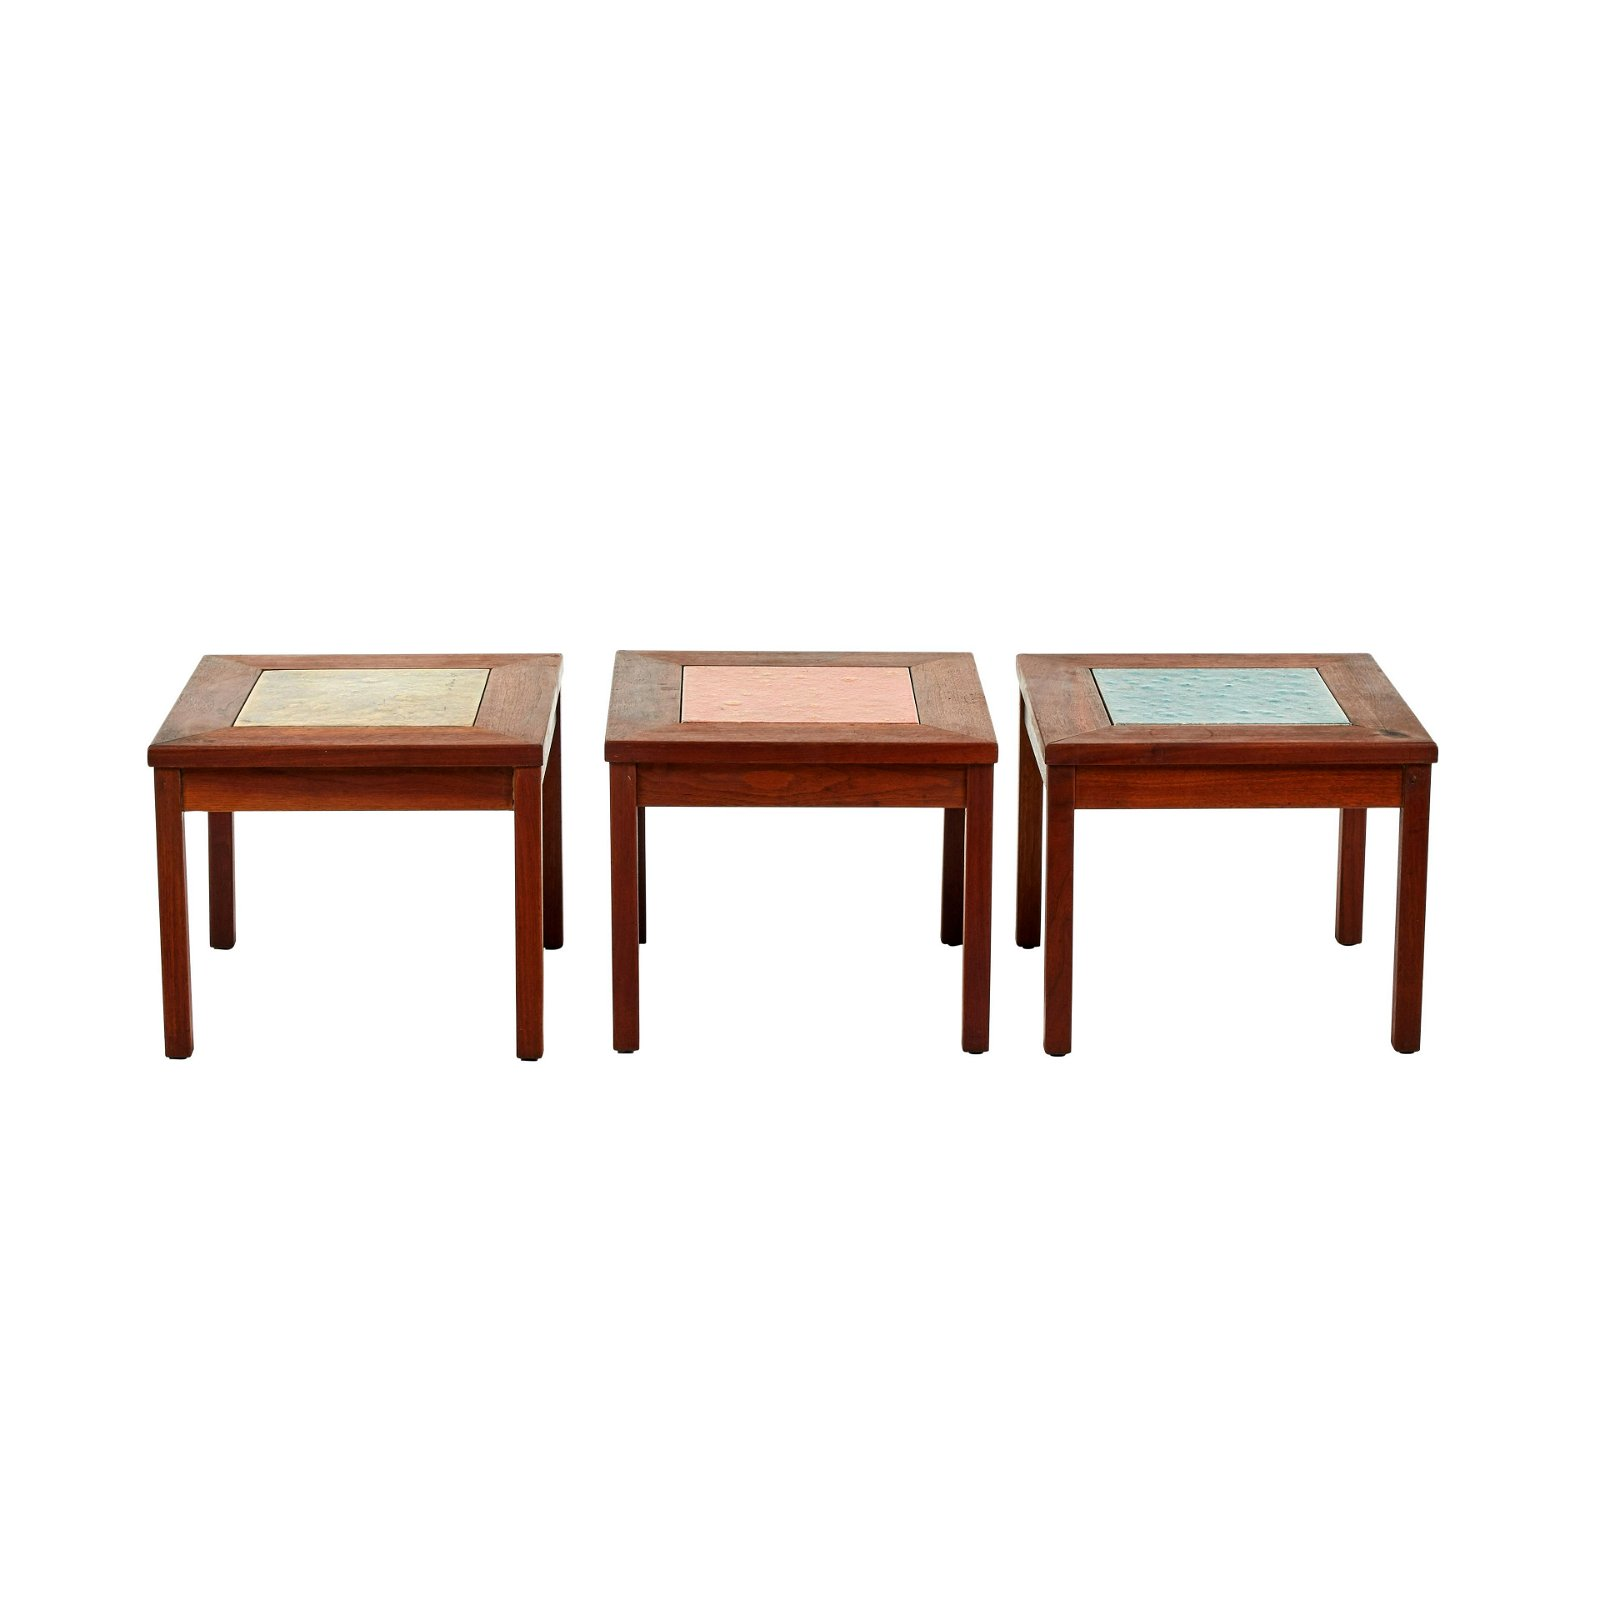 John Keal Side Tables (3)